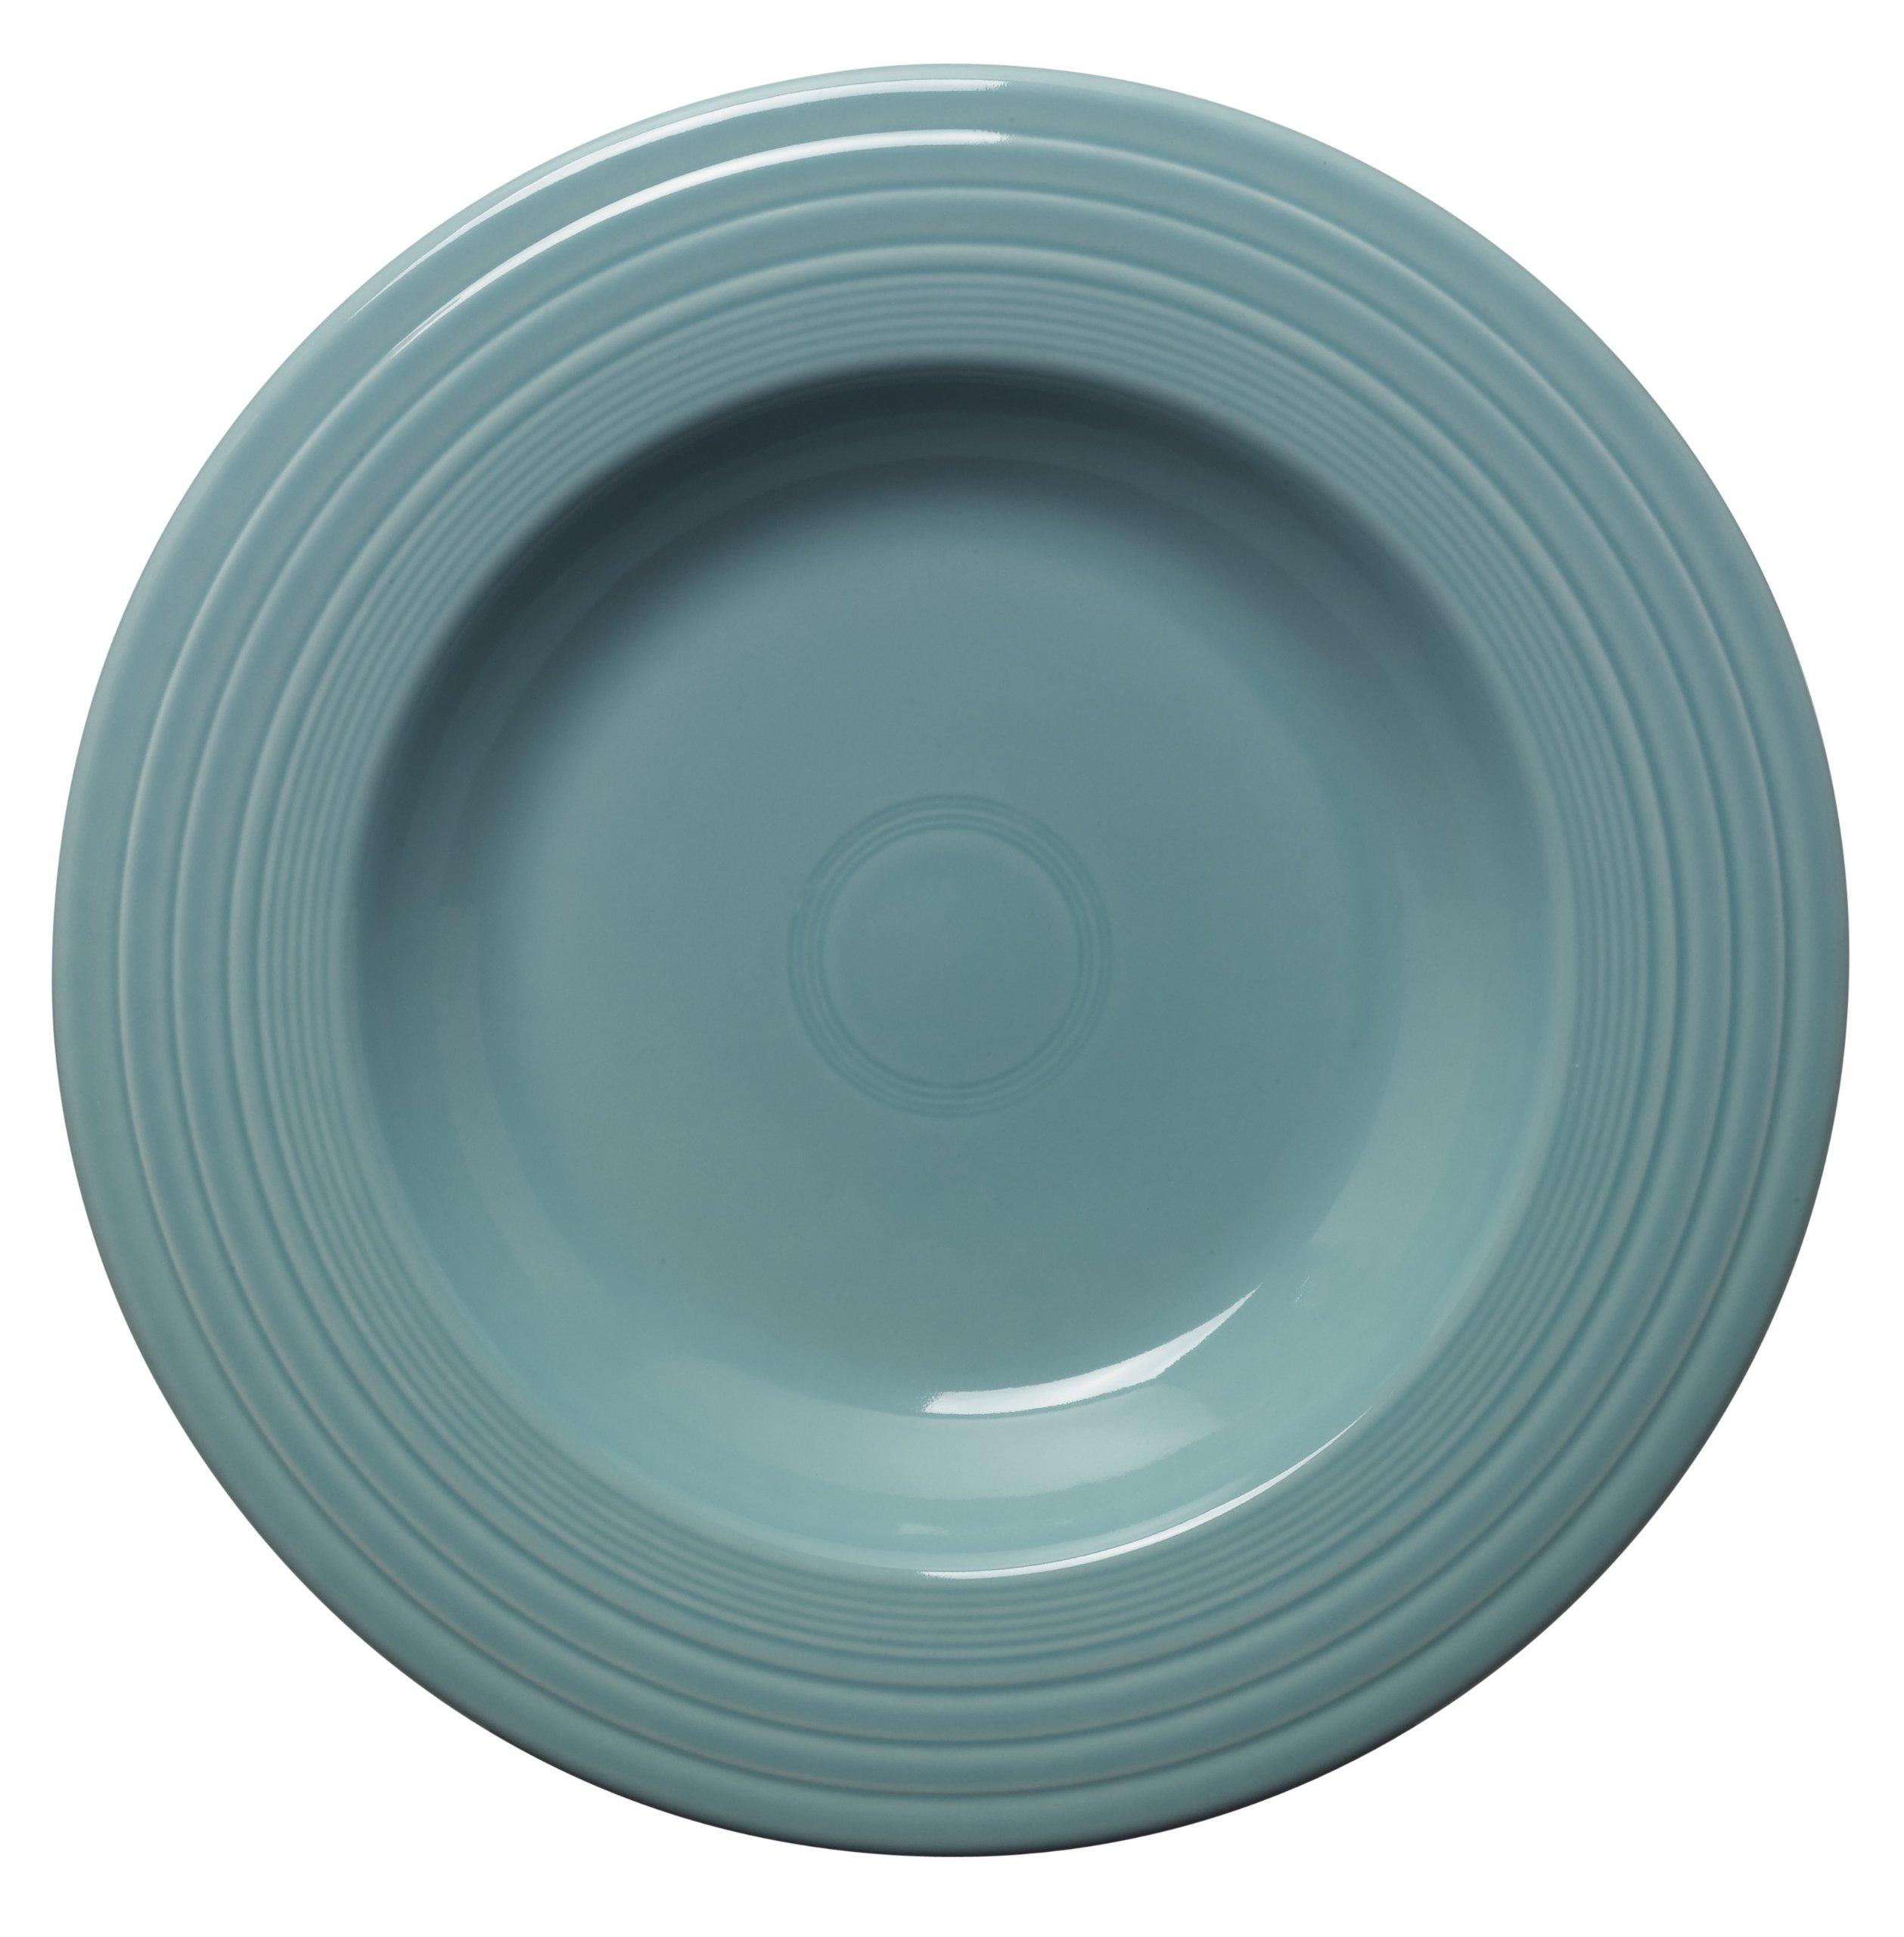 Fiesta 12-Inch Pasta Bowl, Turquoise